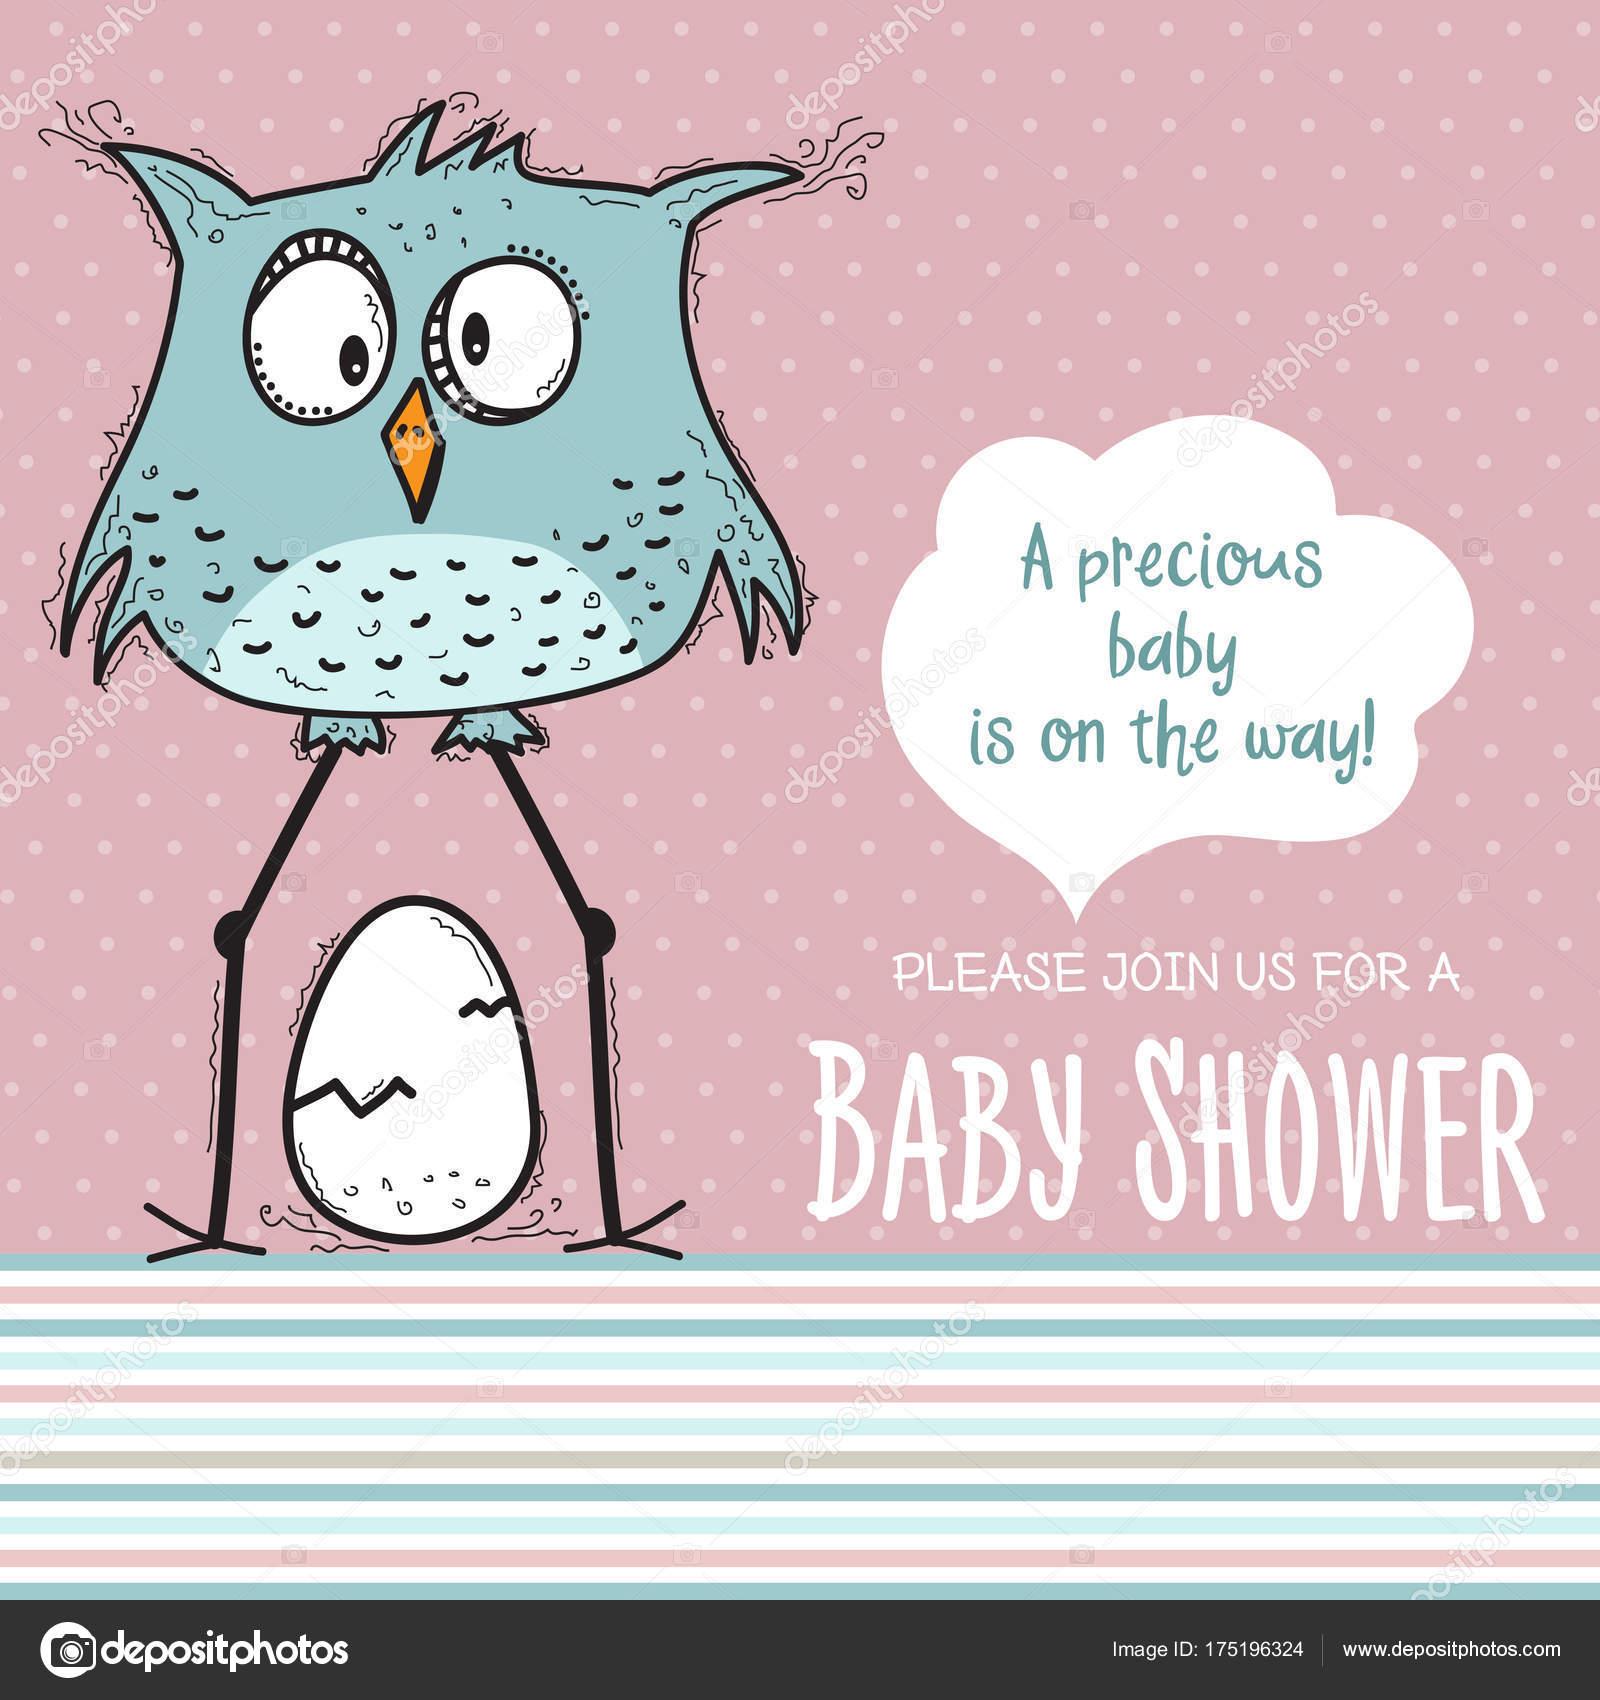 Baby Shower Card Template | Baby Shower Card Template Funny Doodle Bird Vector Format Stock